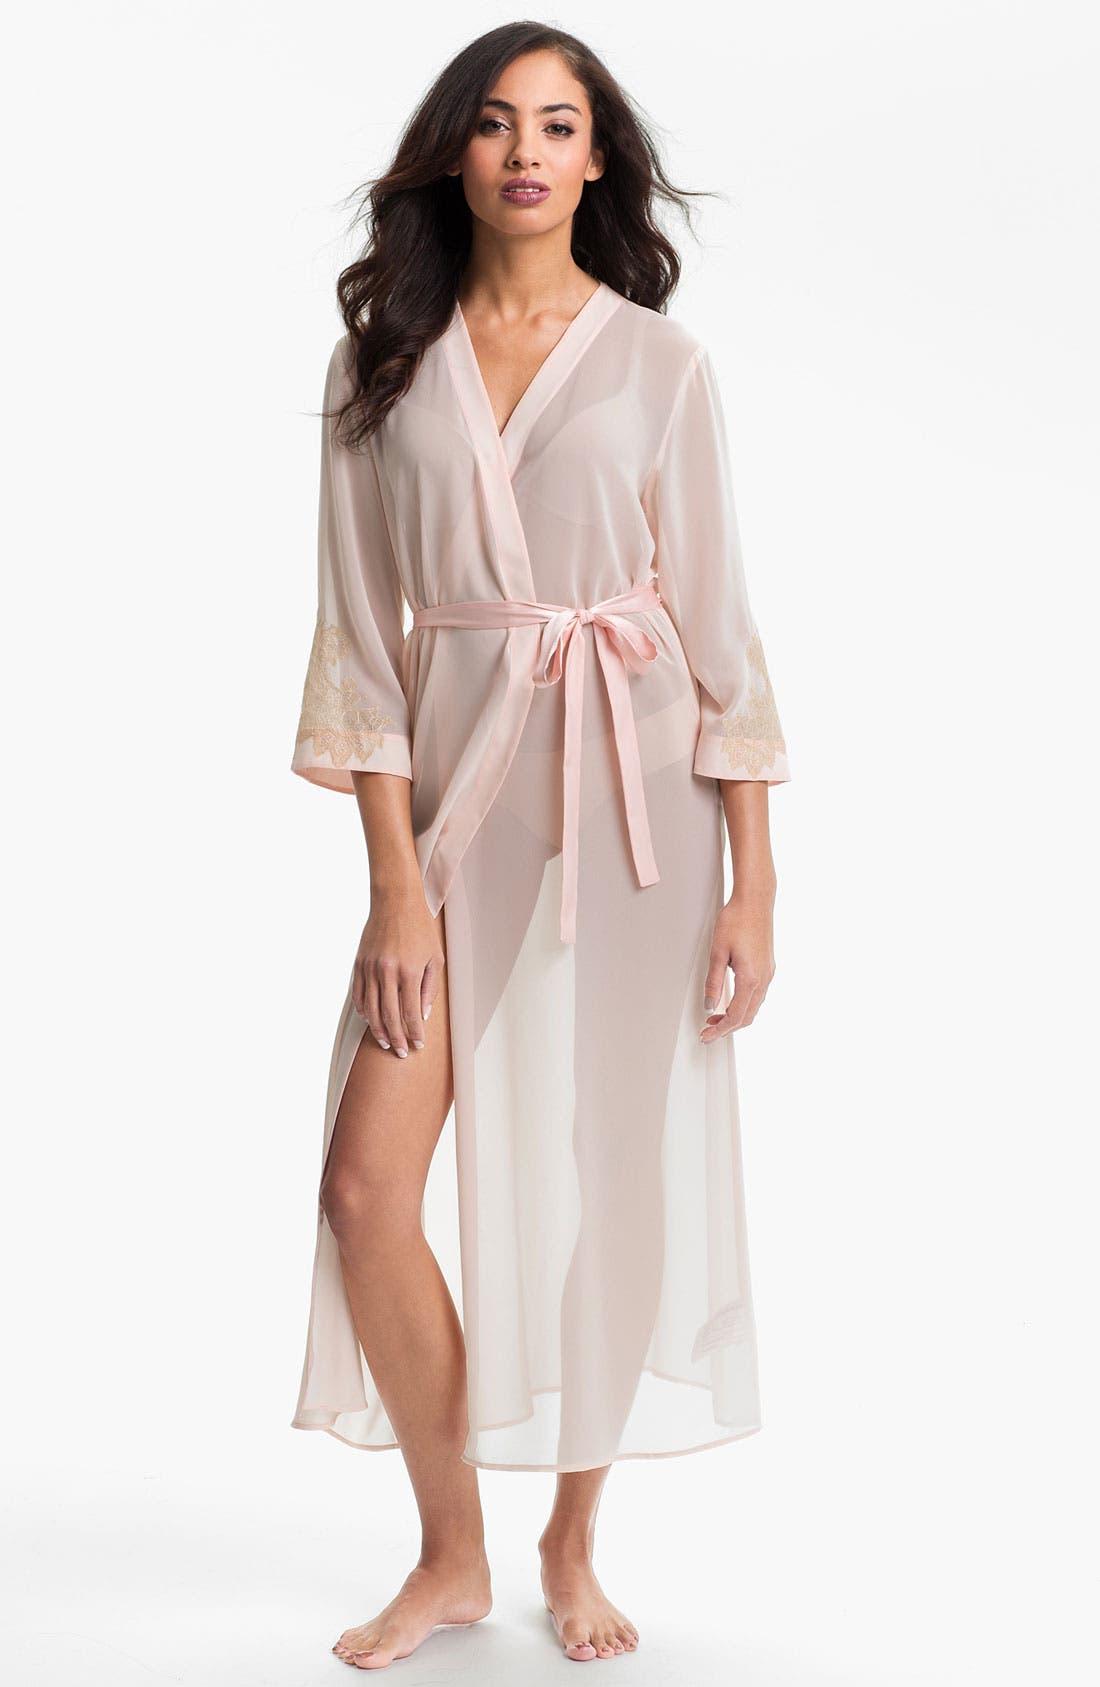 Alternate Image 1 Selected - Oscar de la Renta Sleepwear 'Lace Trellis' Chiffon Robe